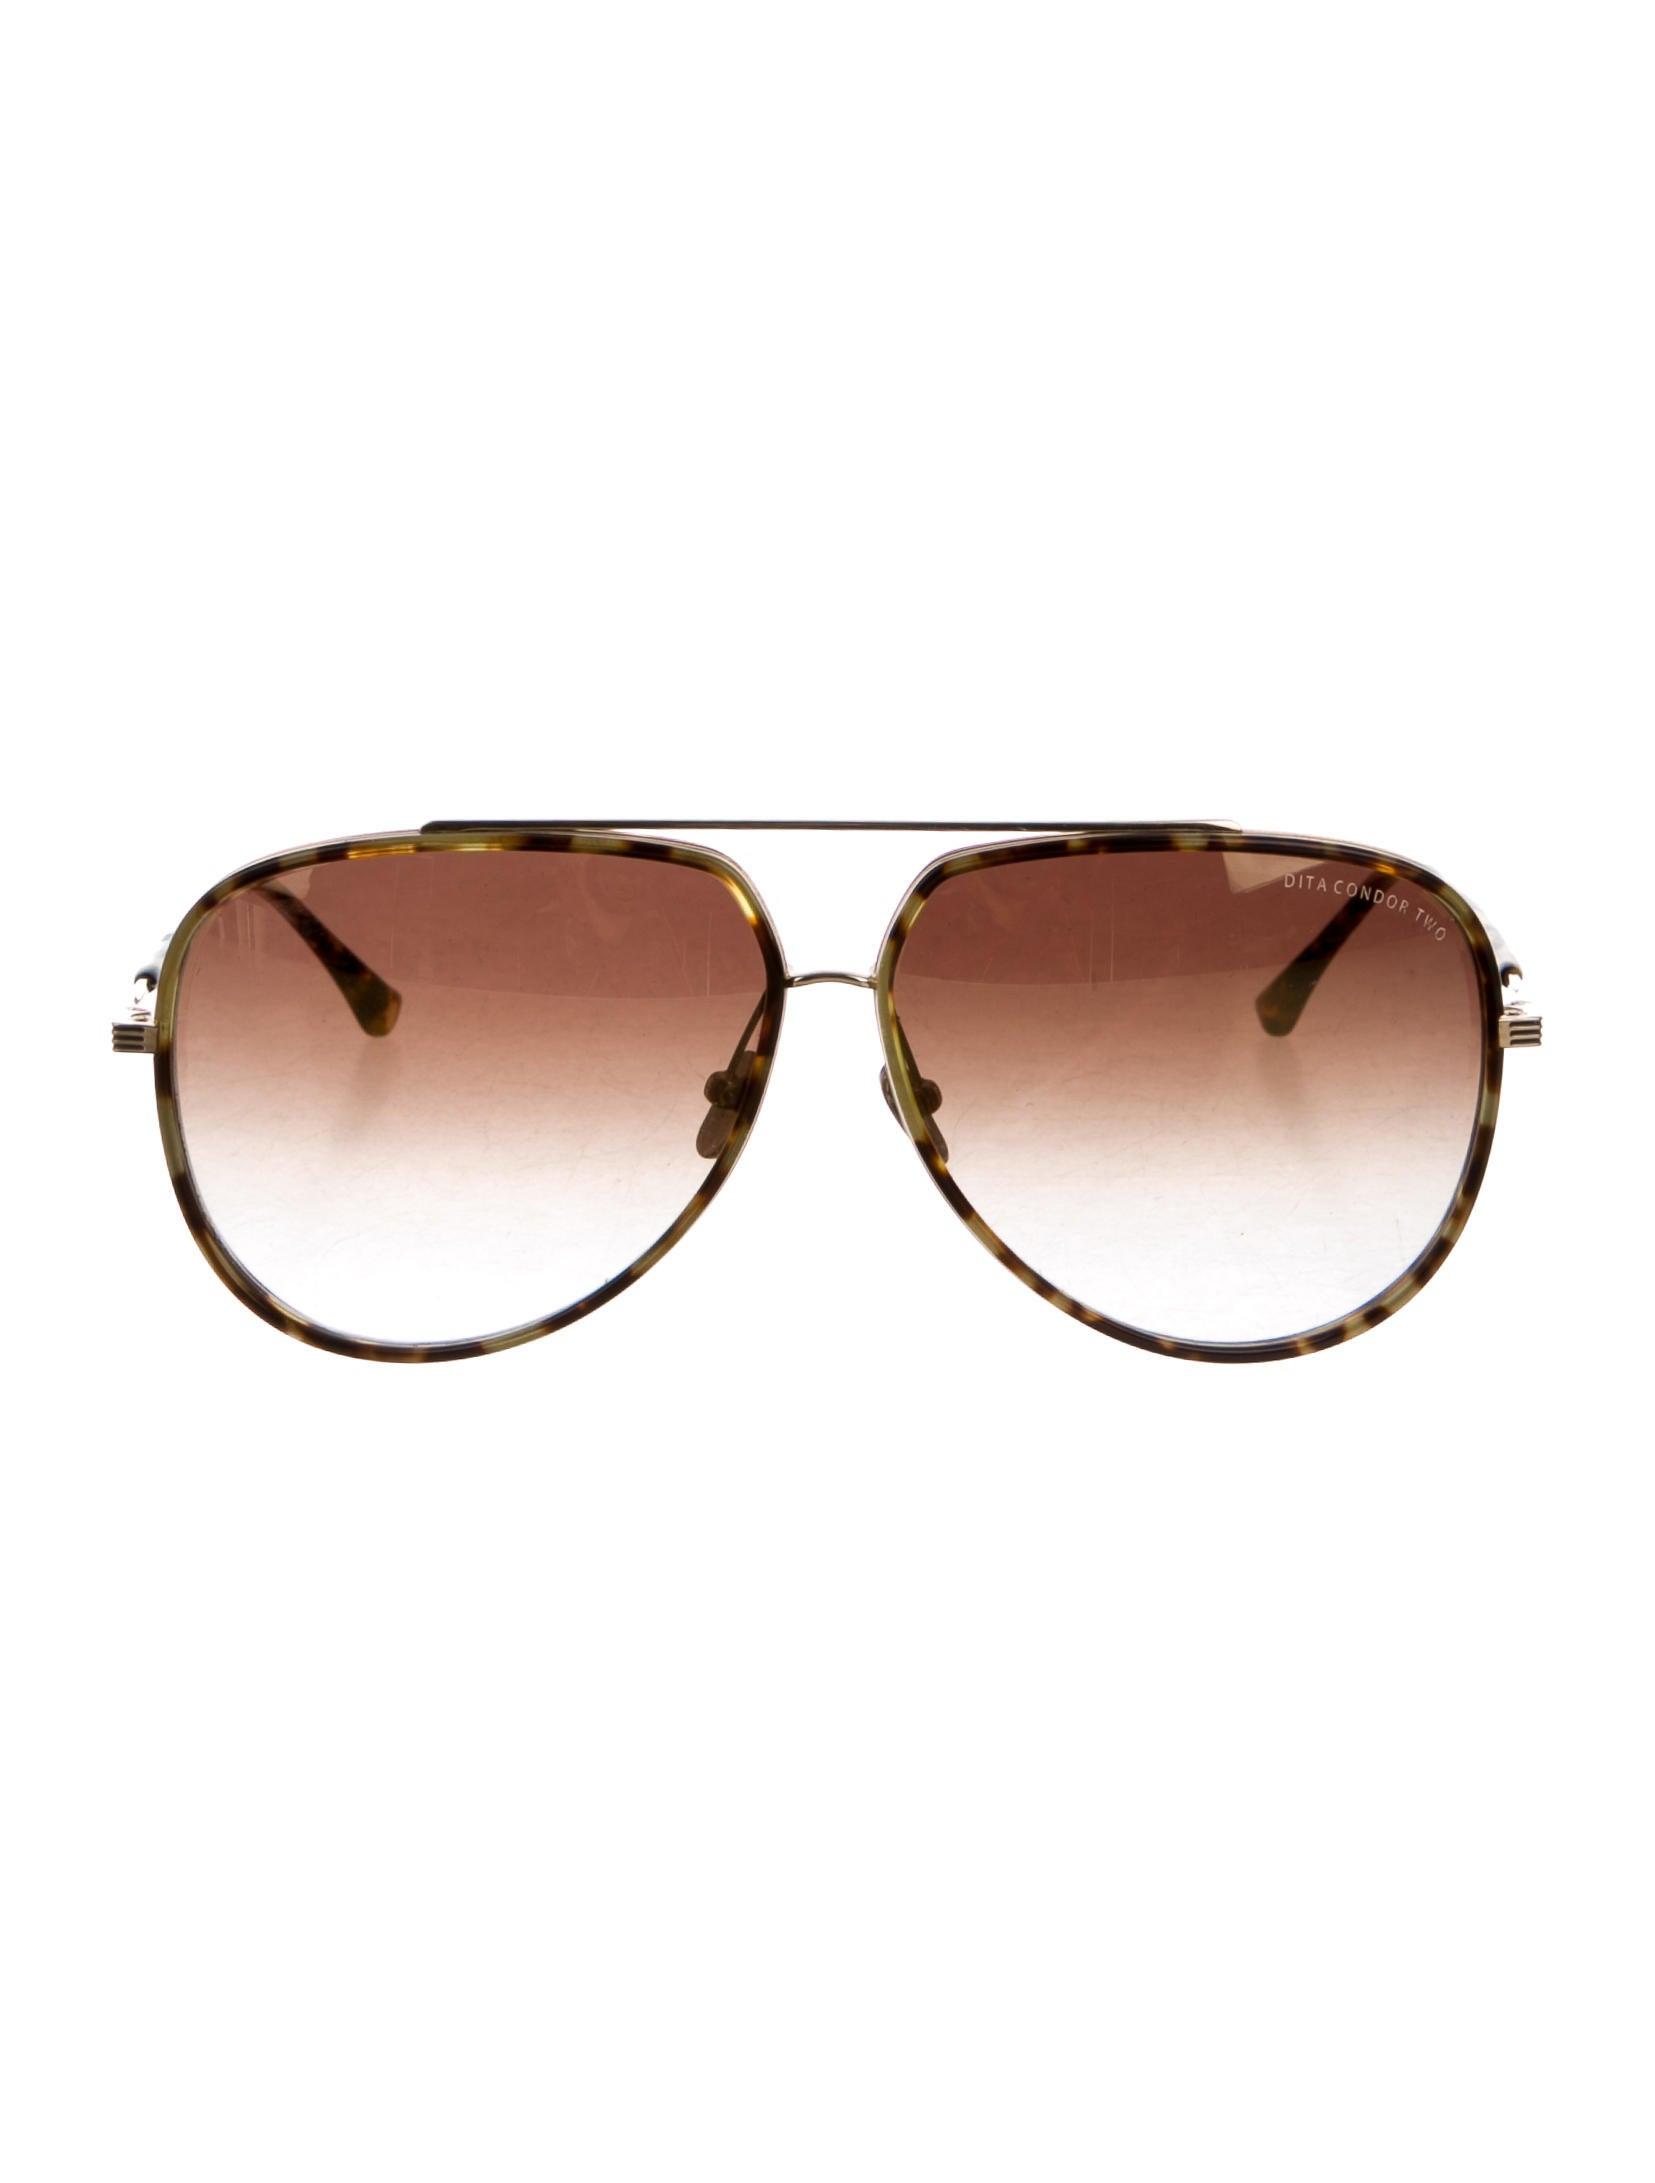 7833606ce6b9 Dita Condor Aviator Sunglasses Pink